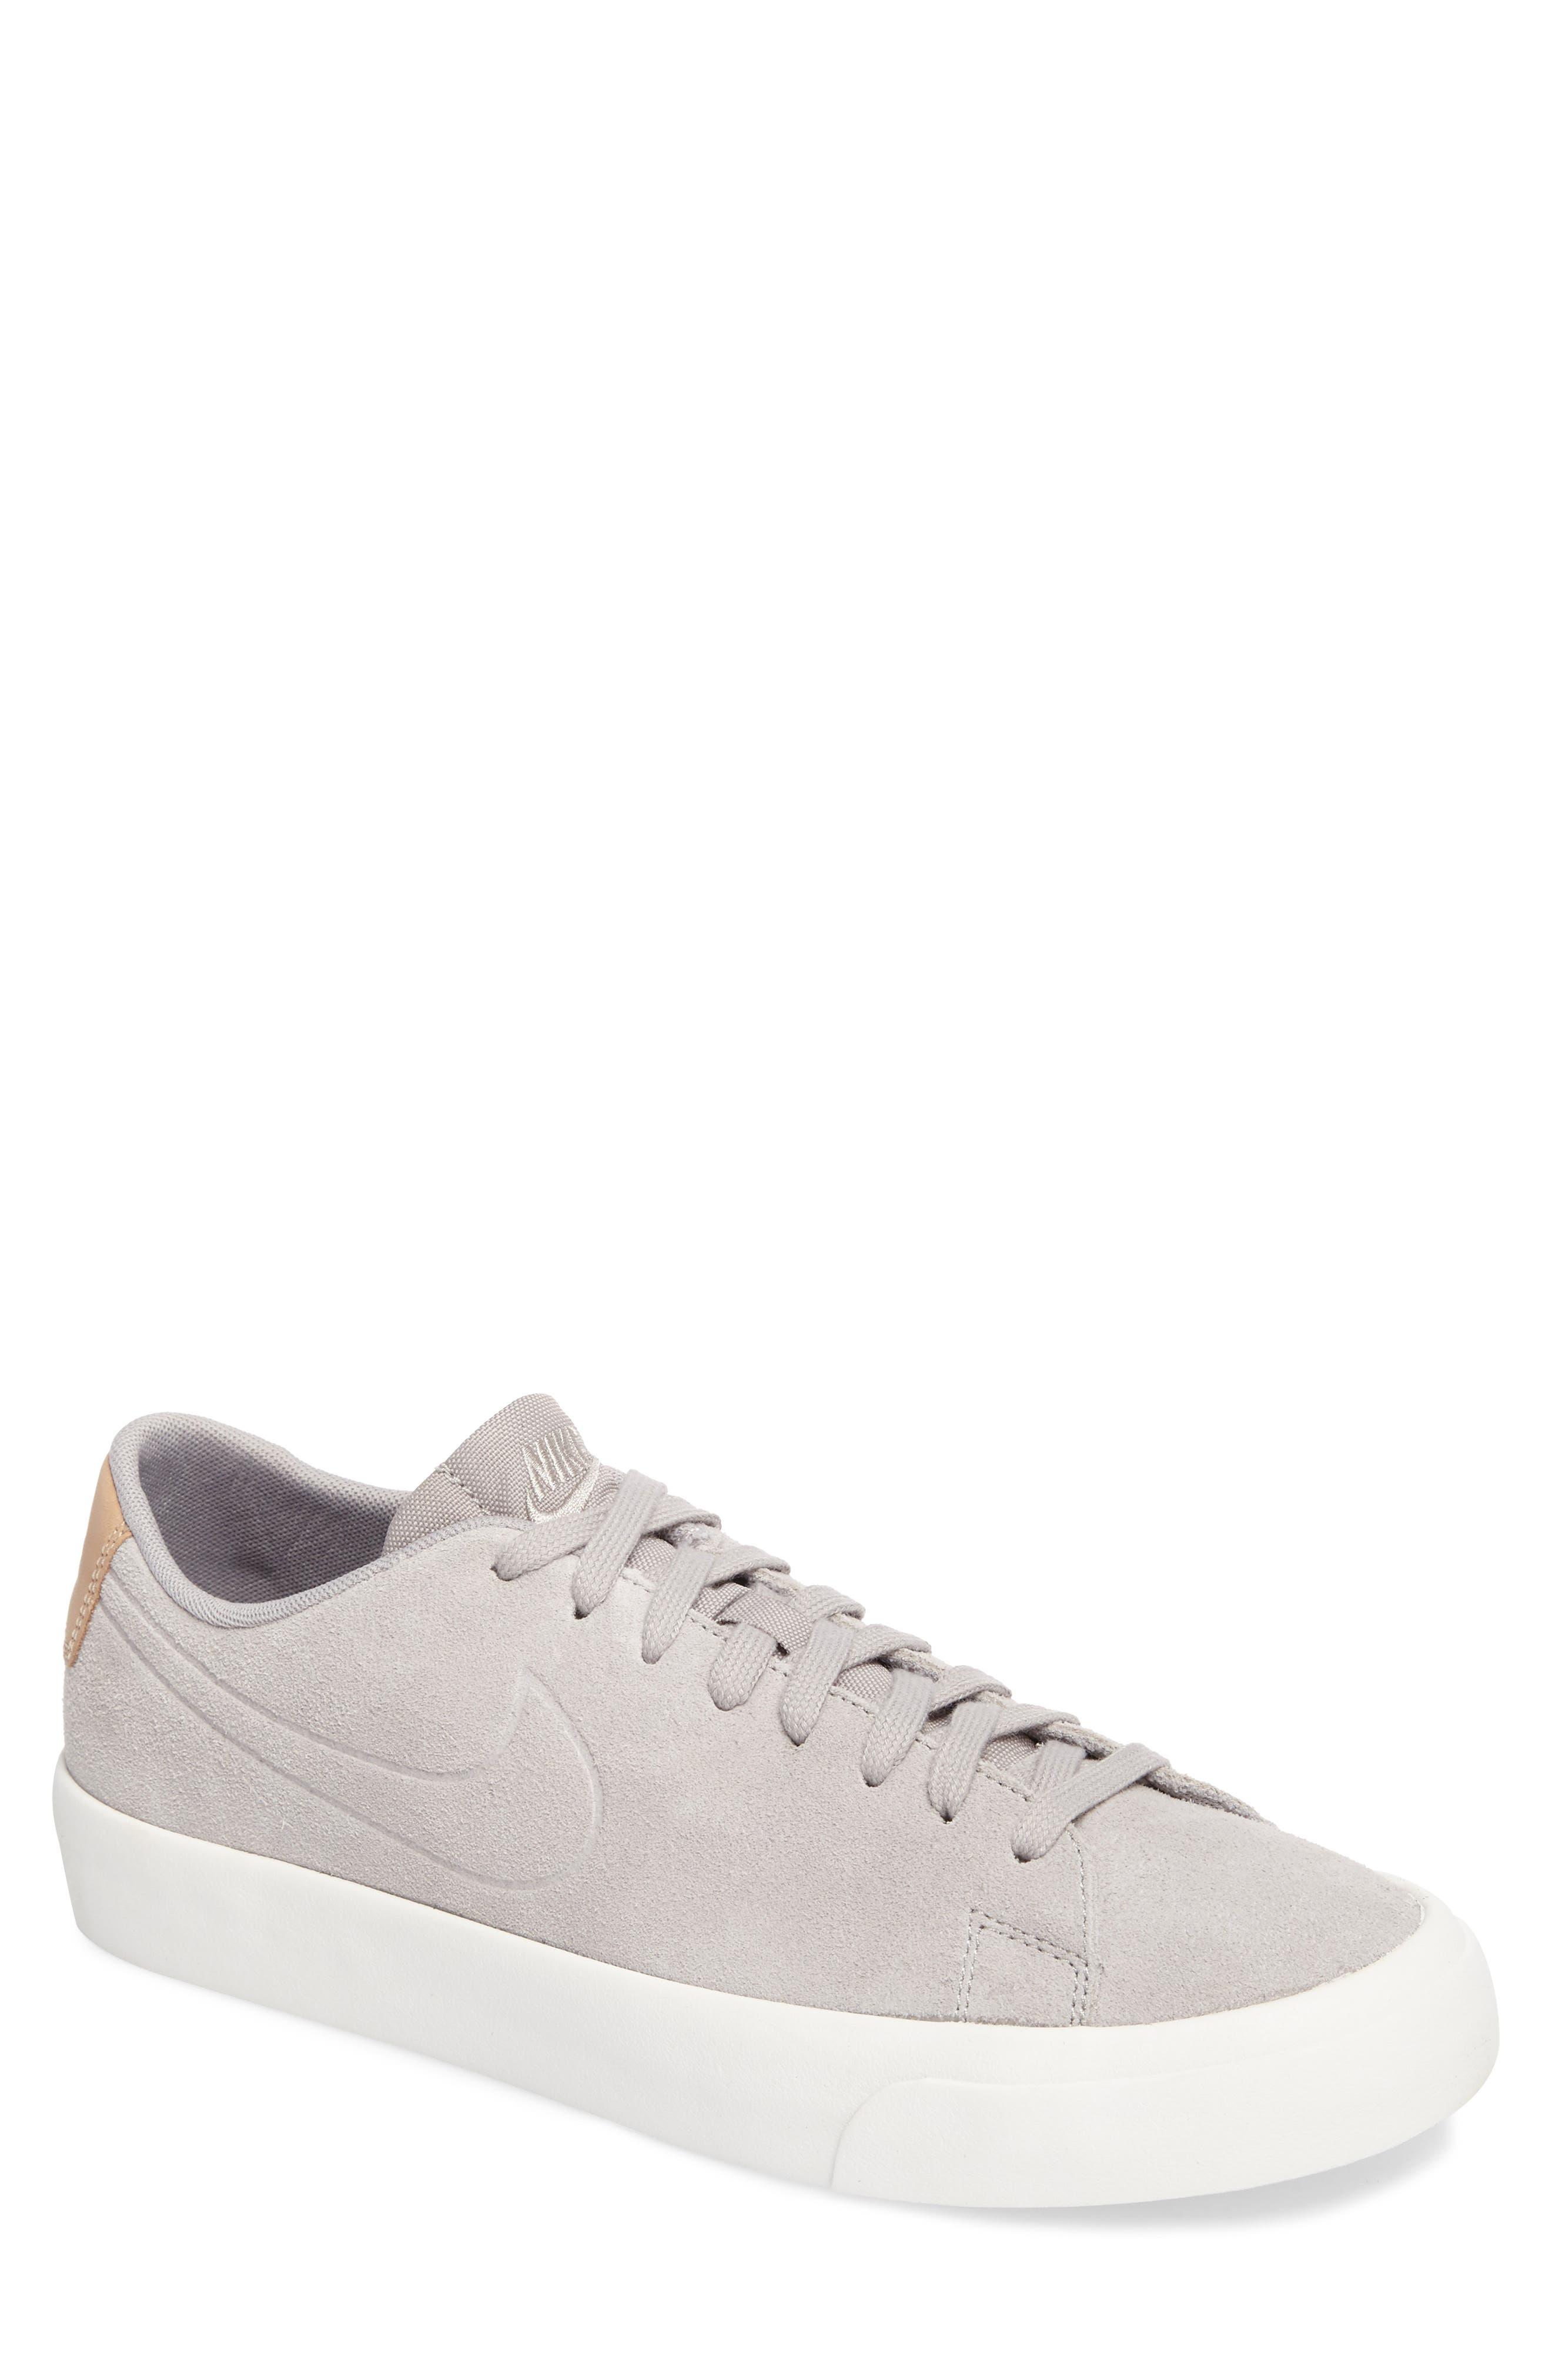 Main Image - Nike Blazer Studio Sneaker (Men)